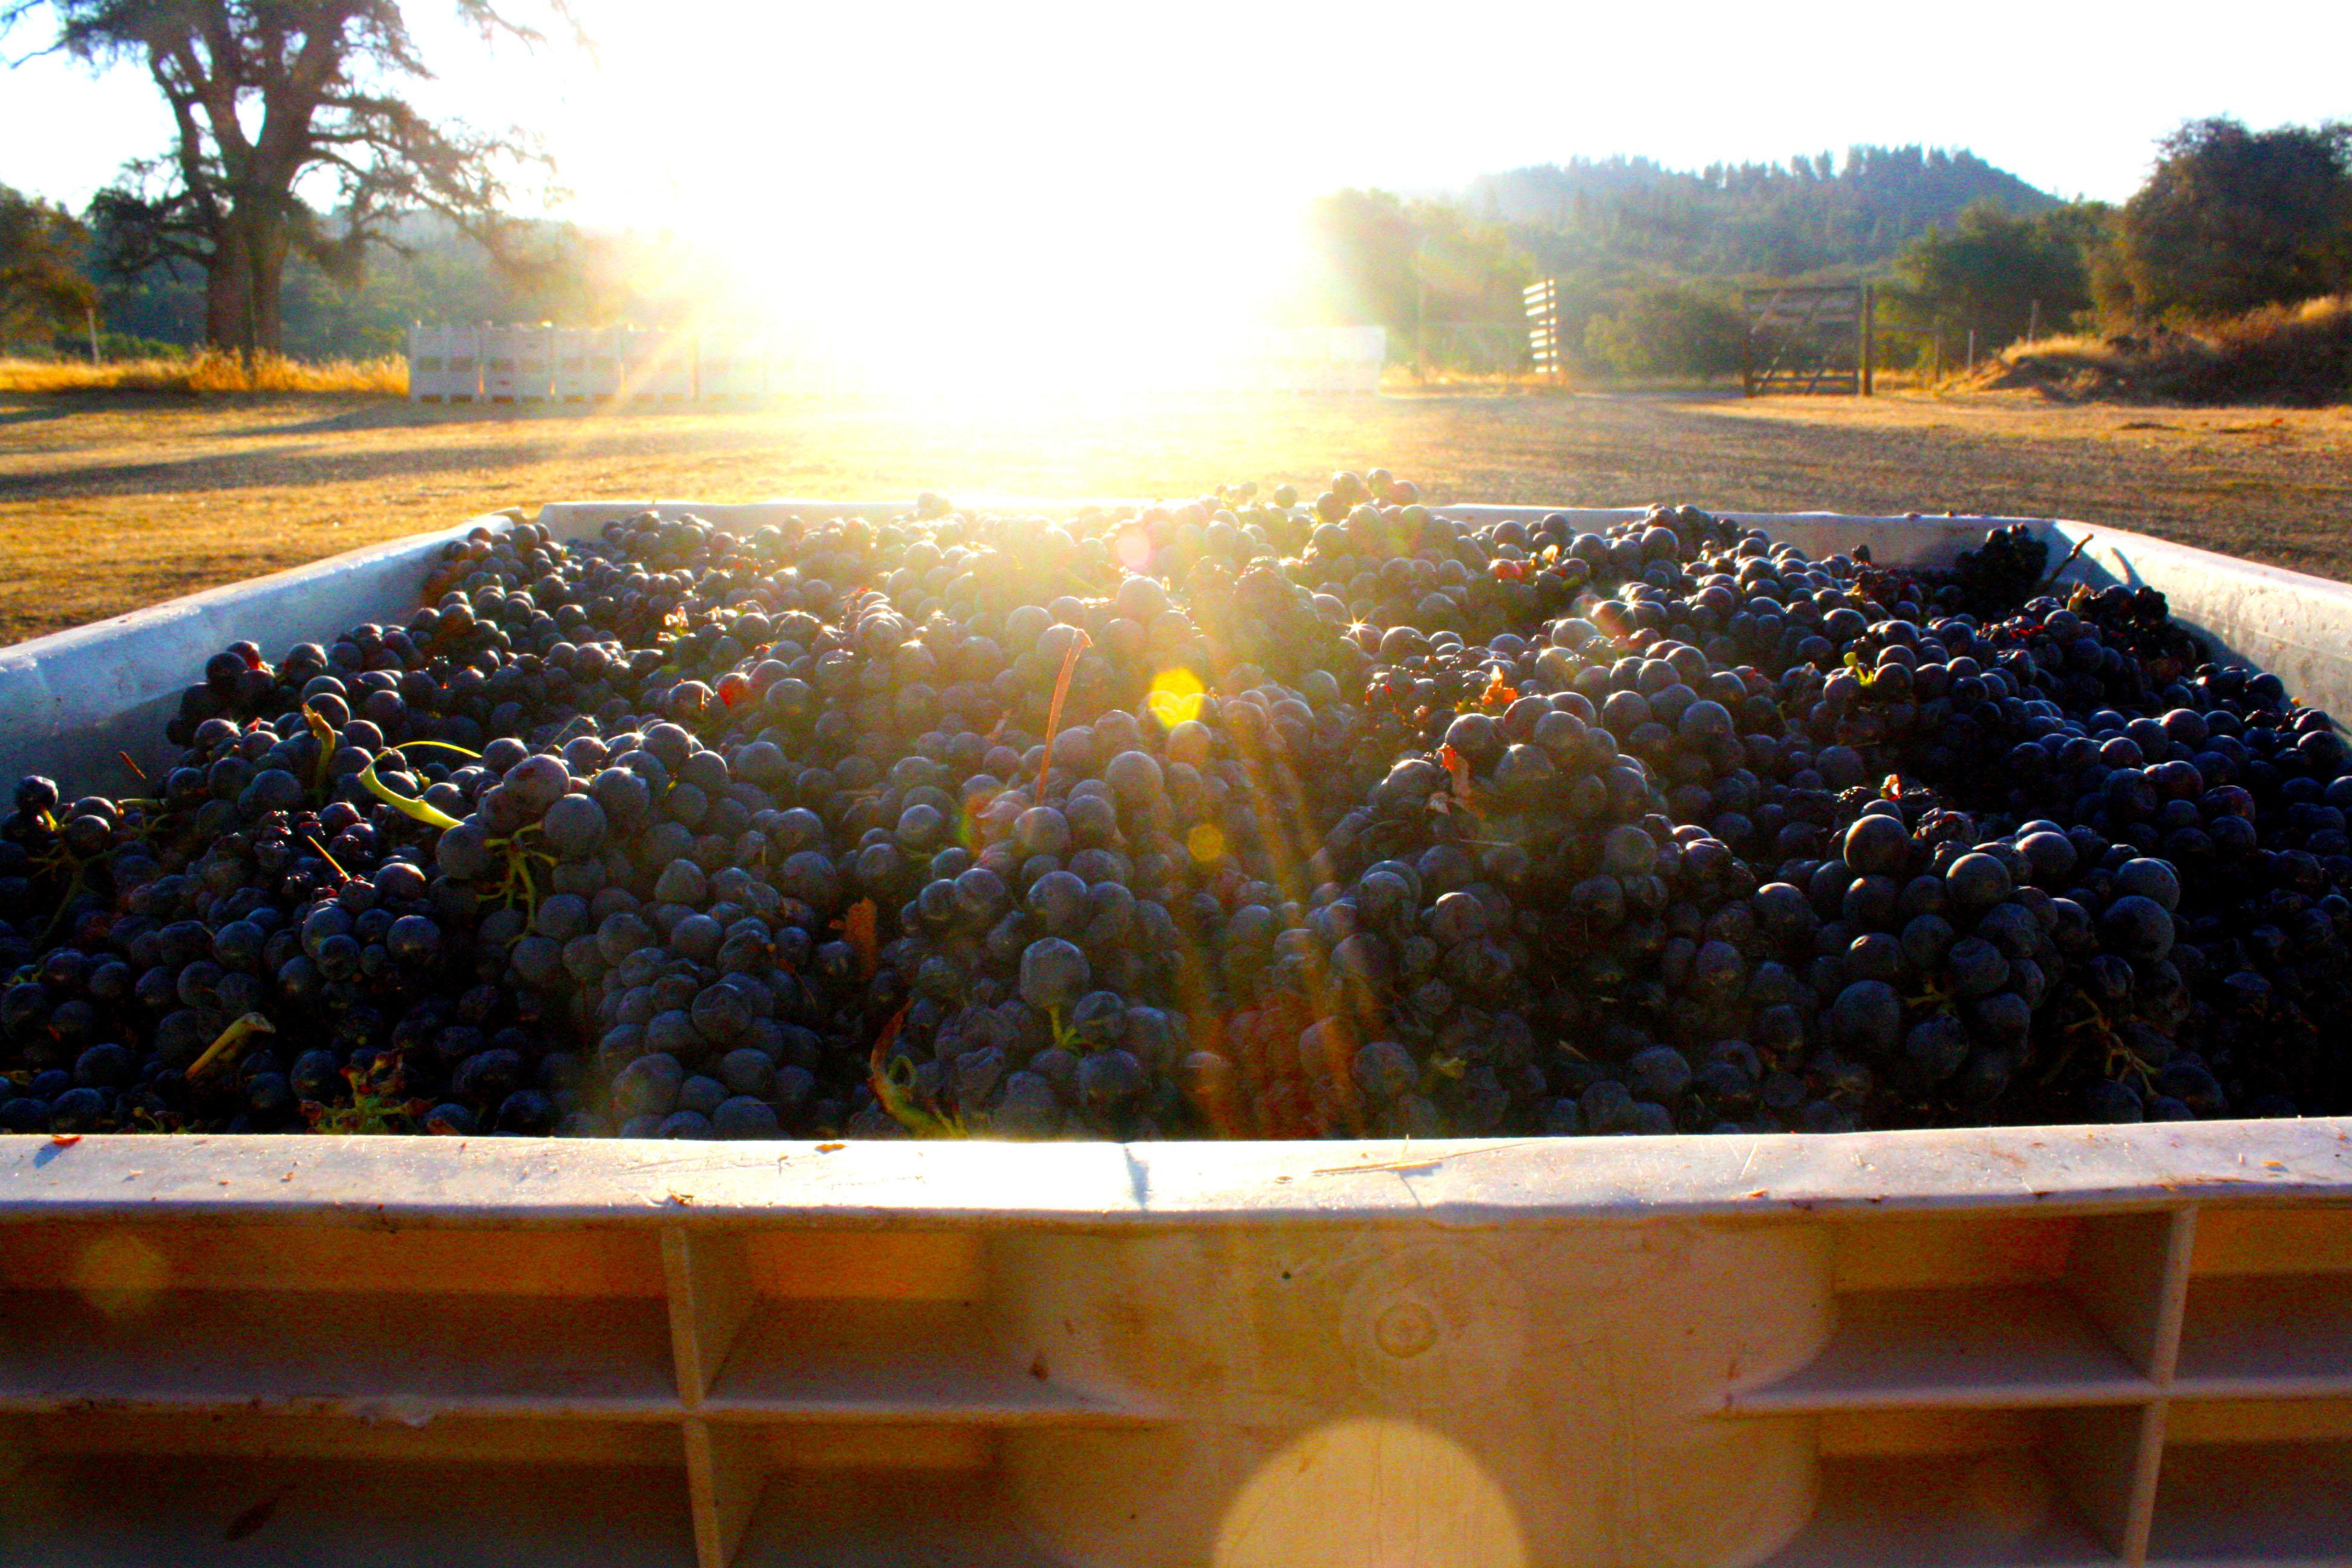 Bin of Grapes at Harvest